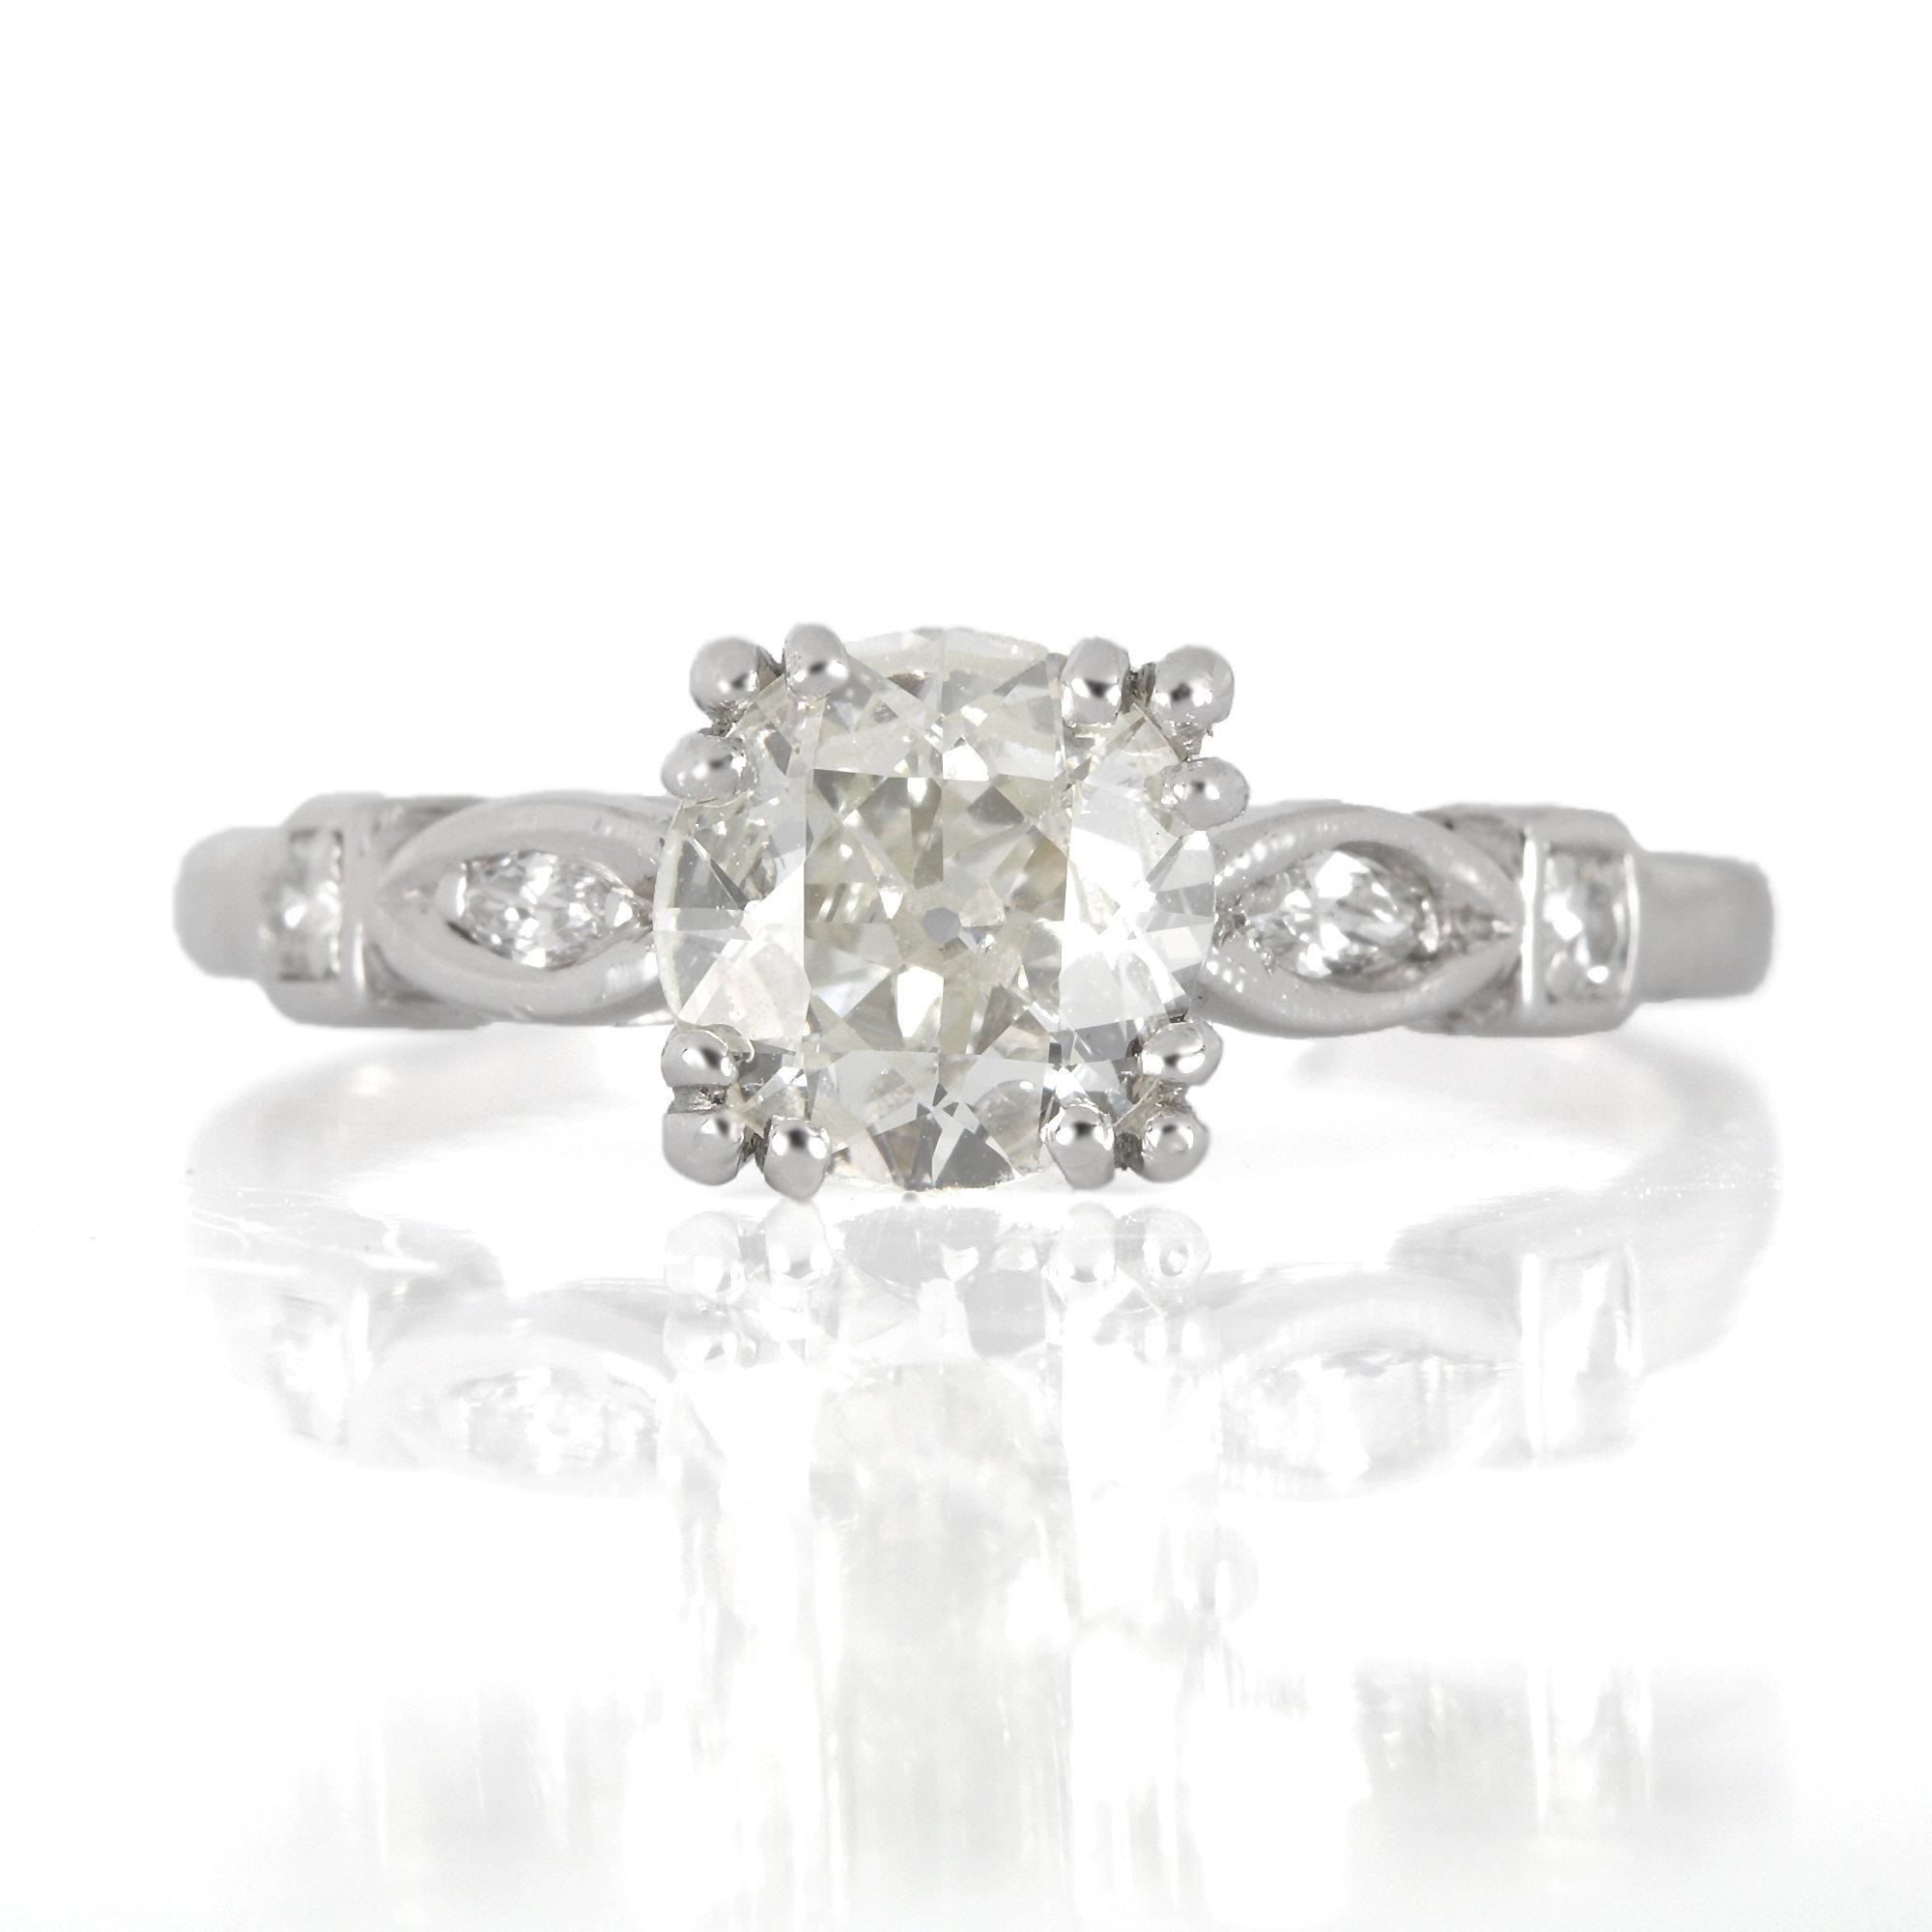 Vintage diamond engagement ring  79 GIA K VS2 old European cut  Platinum